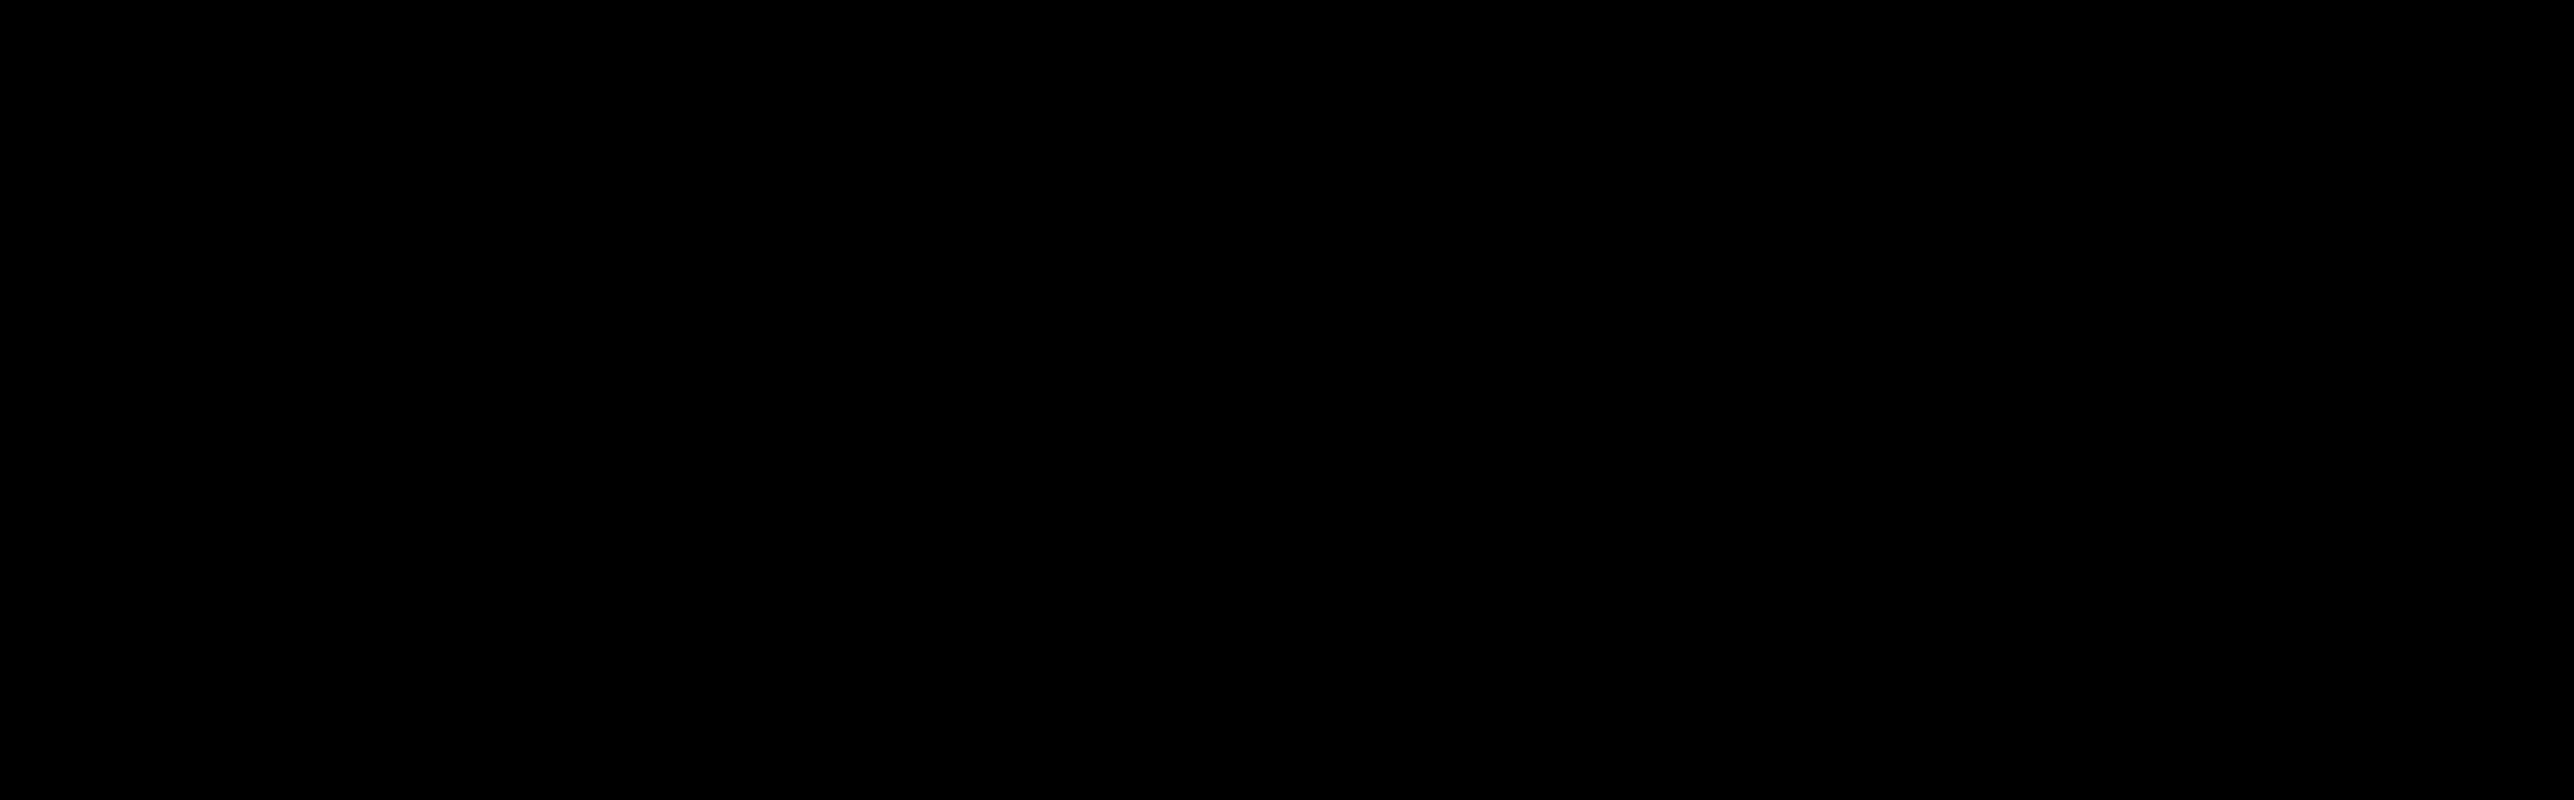 Sight Machine company logo